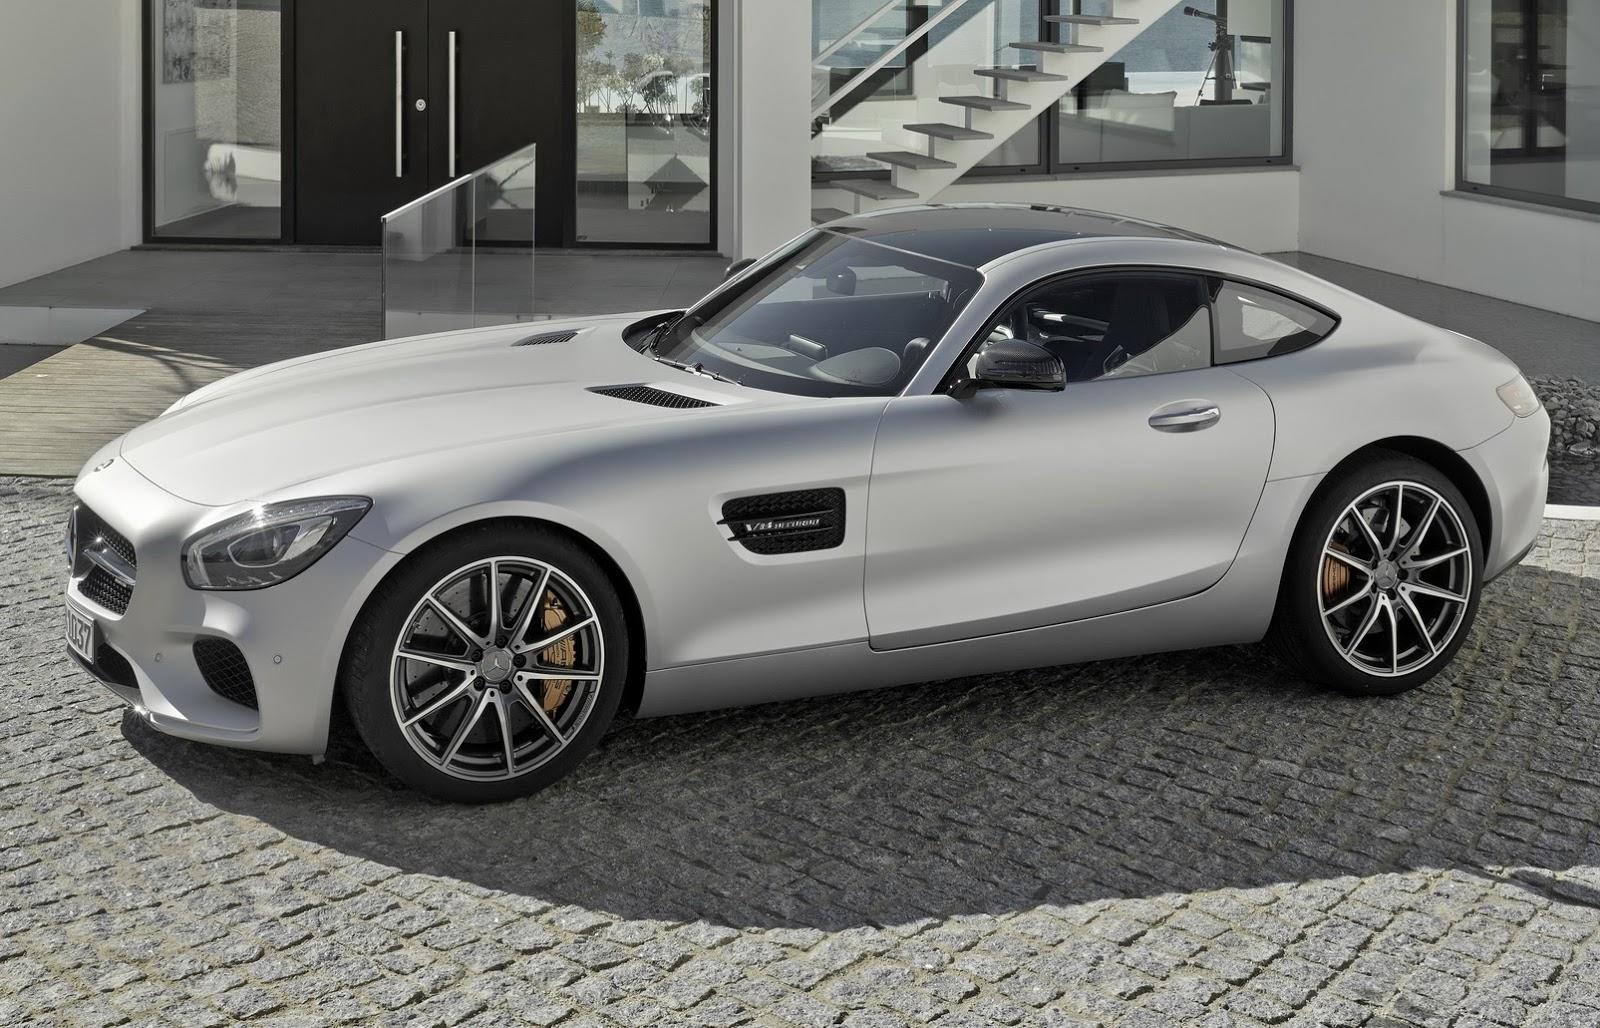 Super cars aston martin vantage gt12 vs mercedes benz amg for Mercedes benz amg gt price